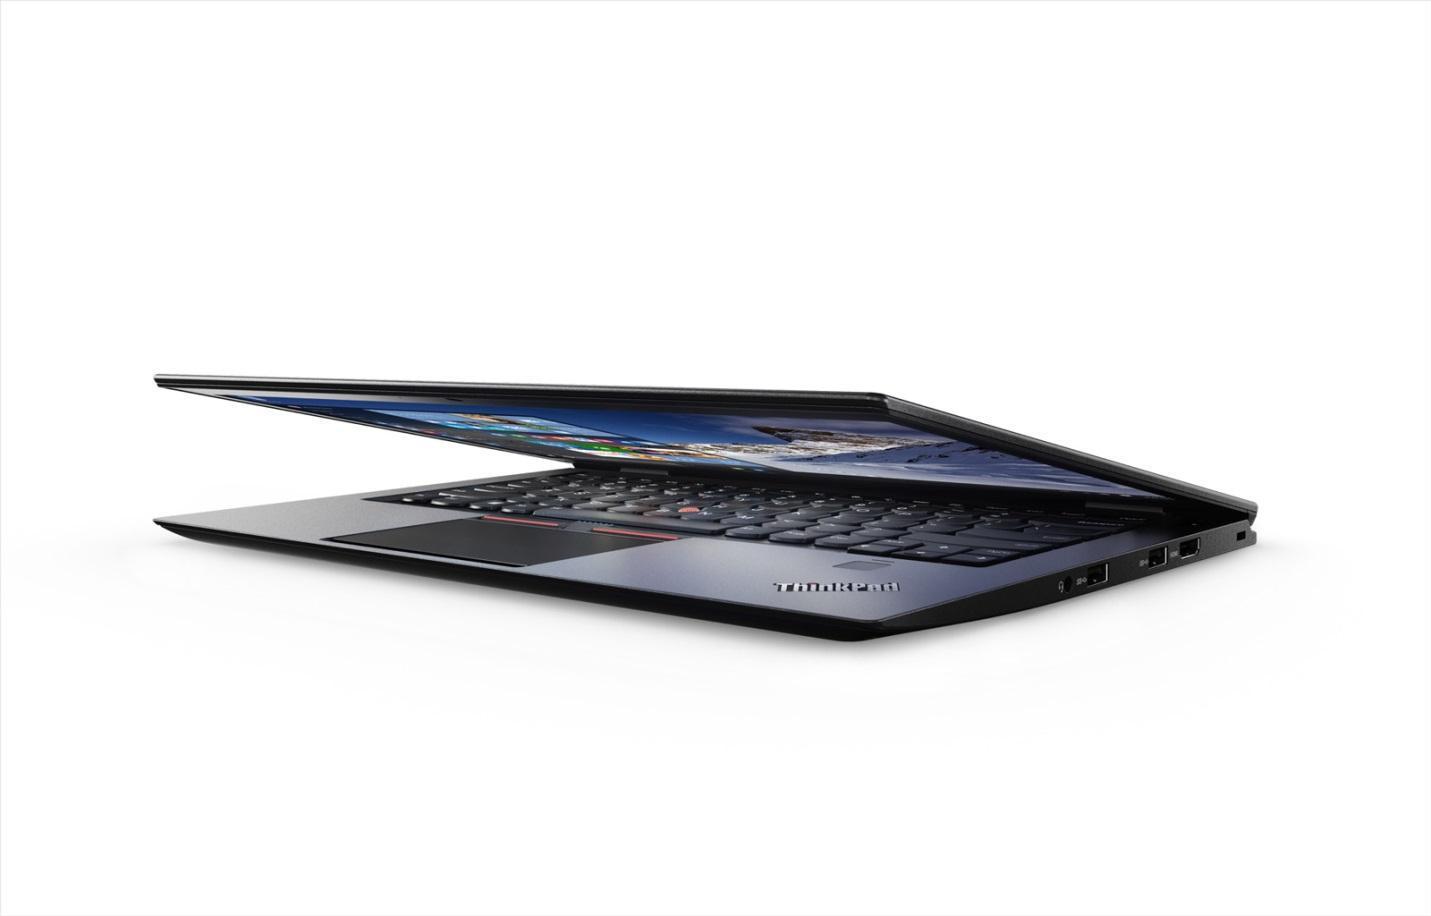 Фото1  Ультрабук ThinkPad X1 Carbon 5th Gen (20HR0067RT)